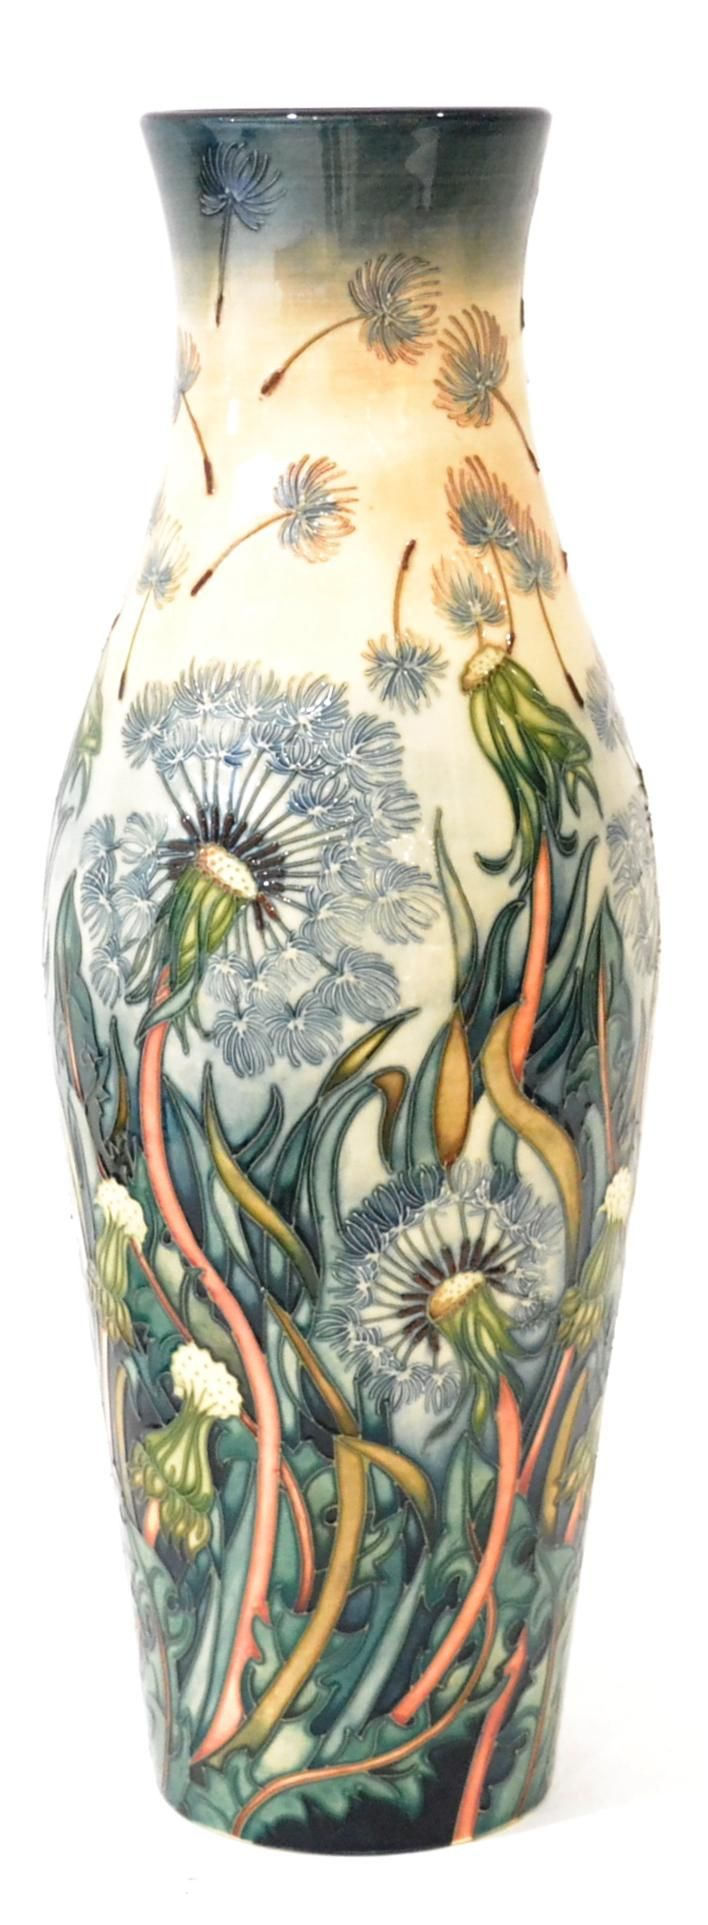 Tennants Auctioneers: A Modern Moorcroft Destiny Pattern Vase